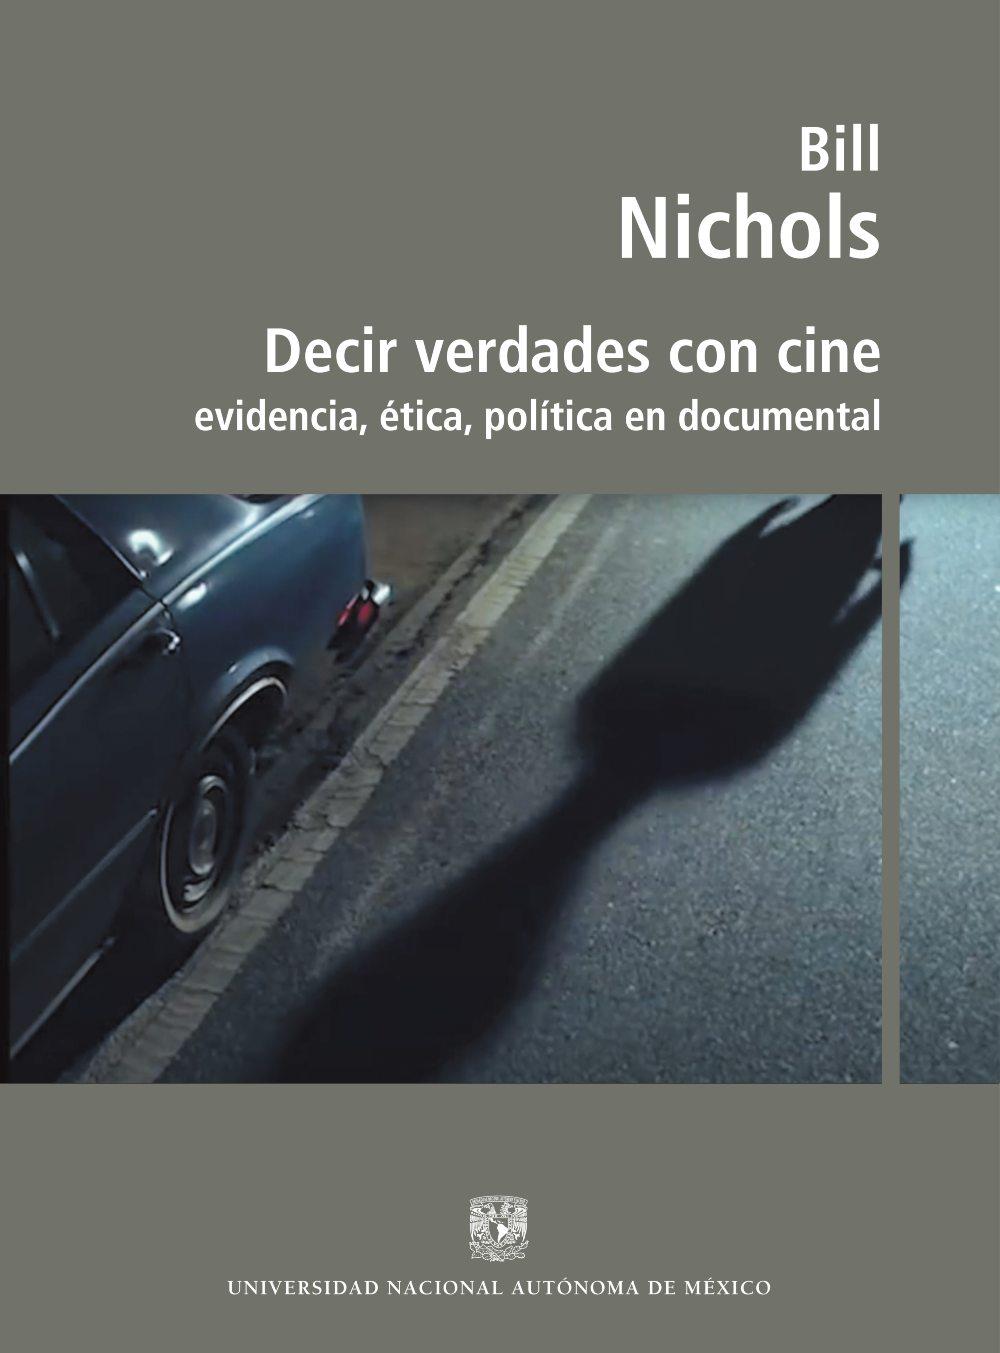 Decir verdades con cine evidencia, ética, política en documental